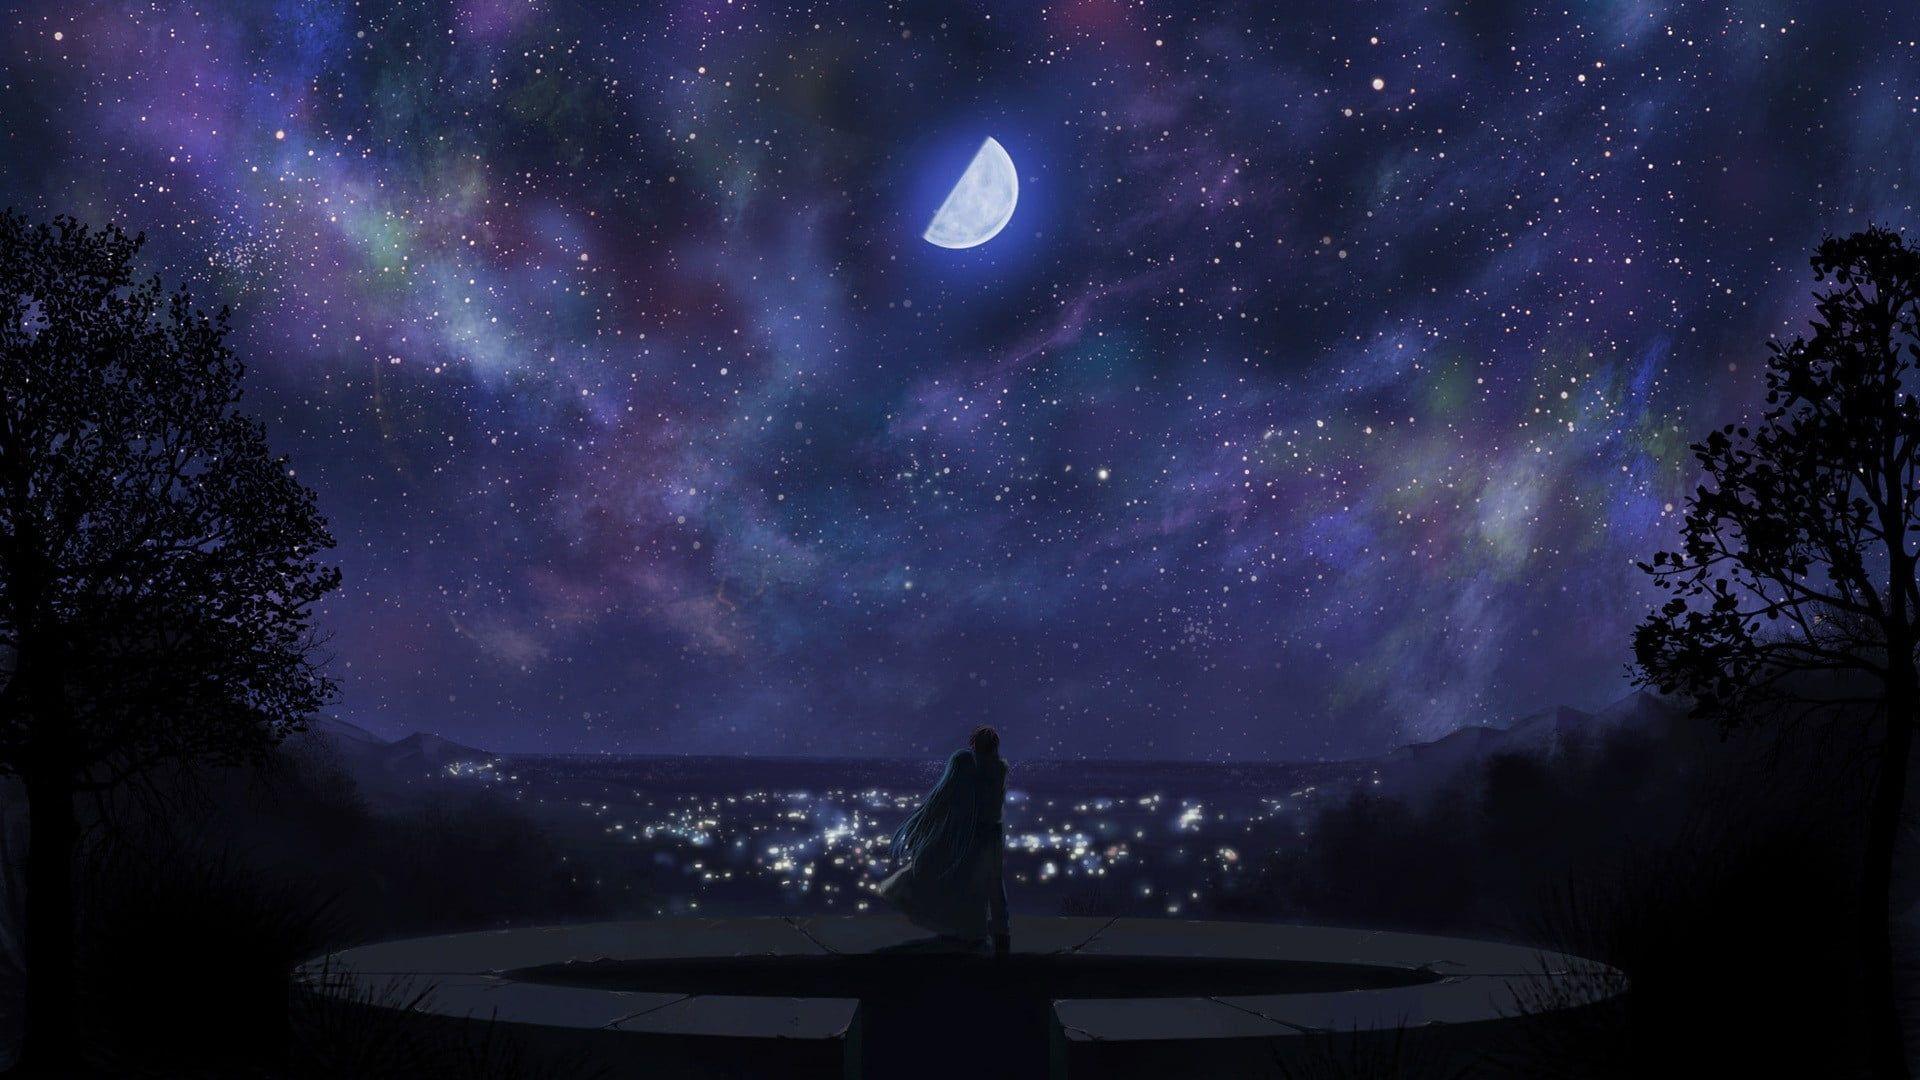 White Cape Anime Sky Moon Clouds City 1080p Wallpaper Hdwallpaper Desktop Anime Background Ribbon In The Sky Night Sky Wallpaper